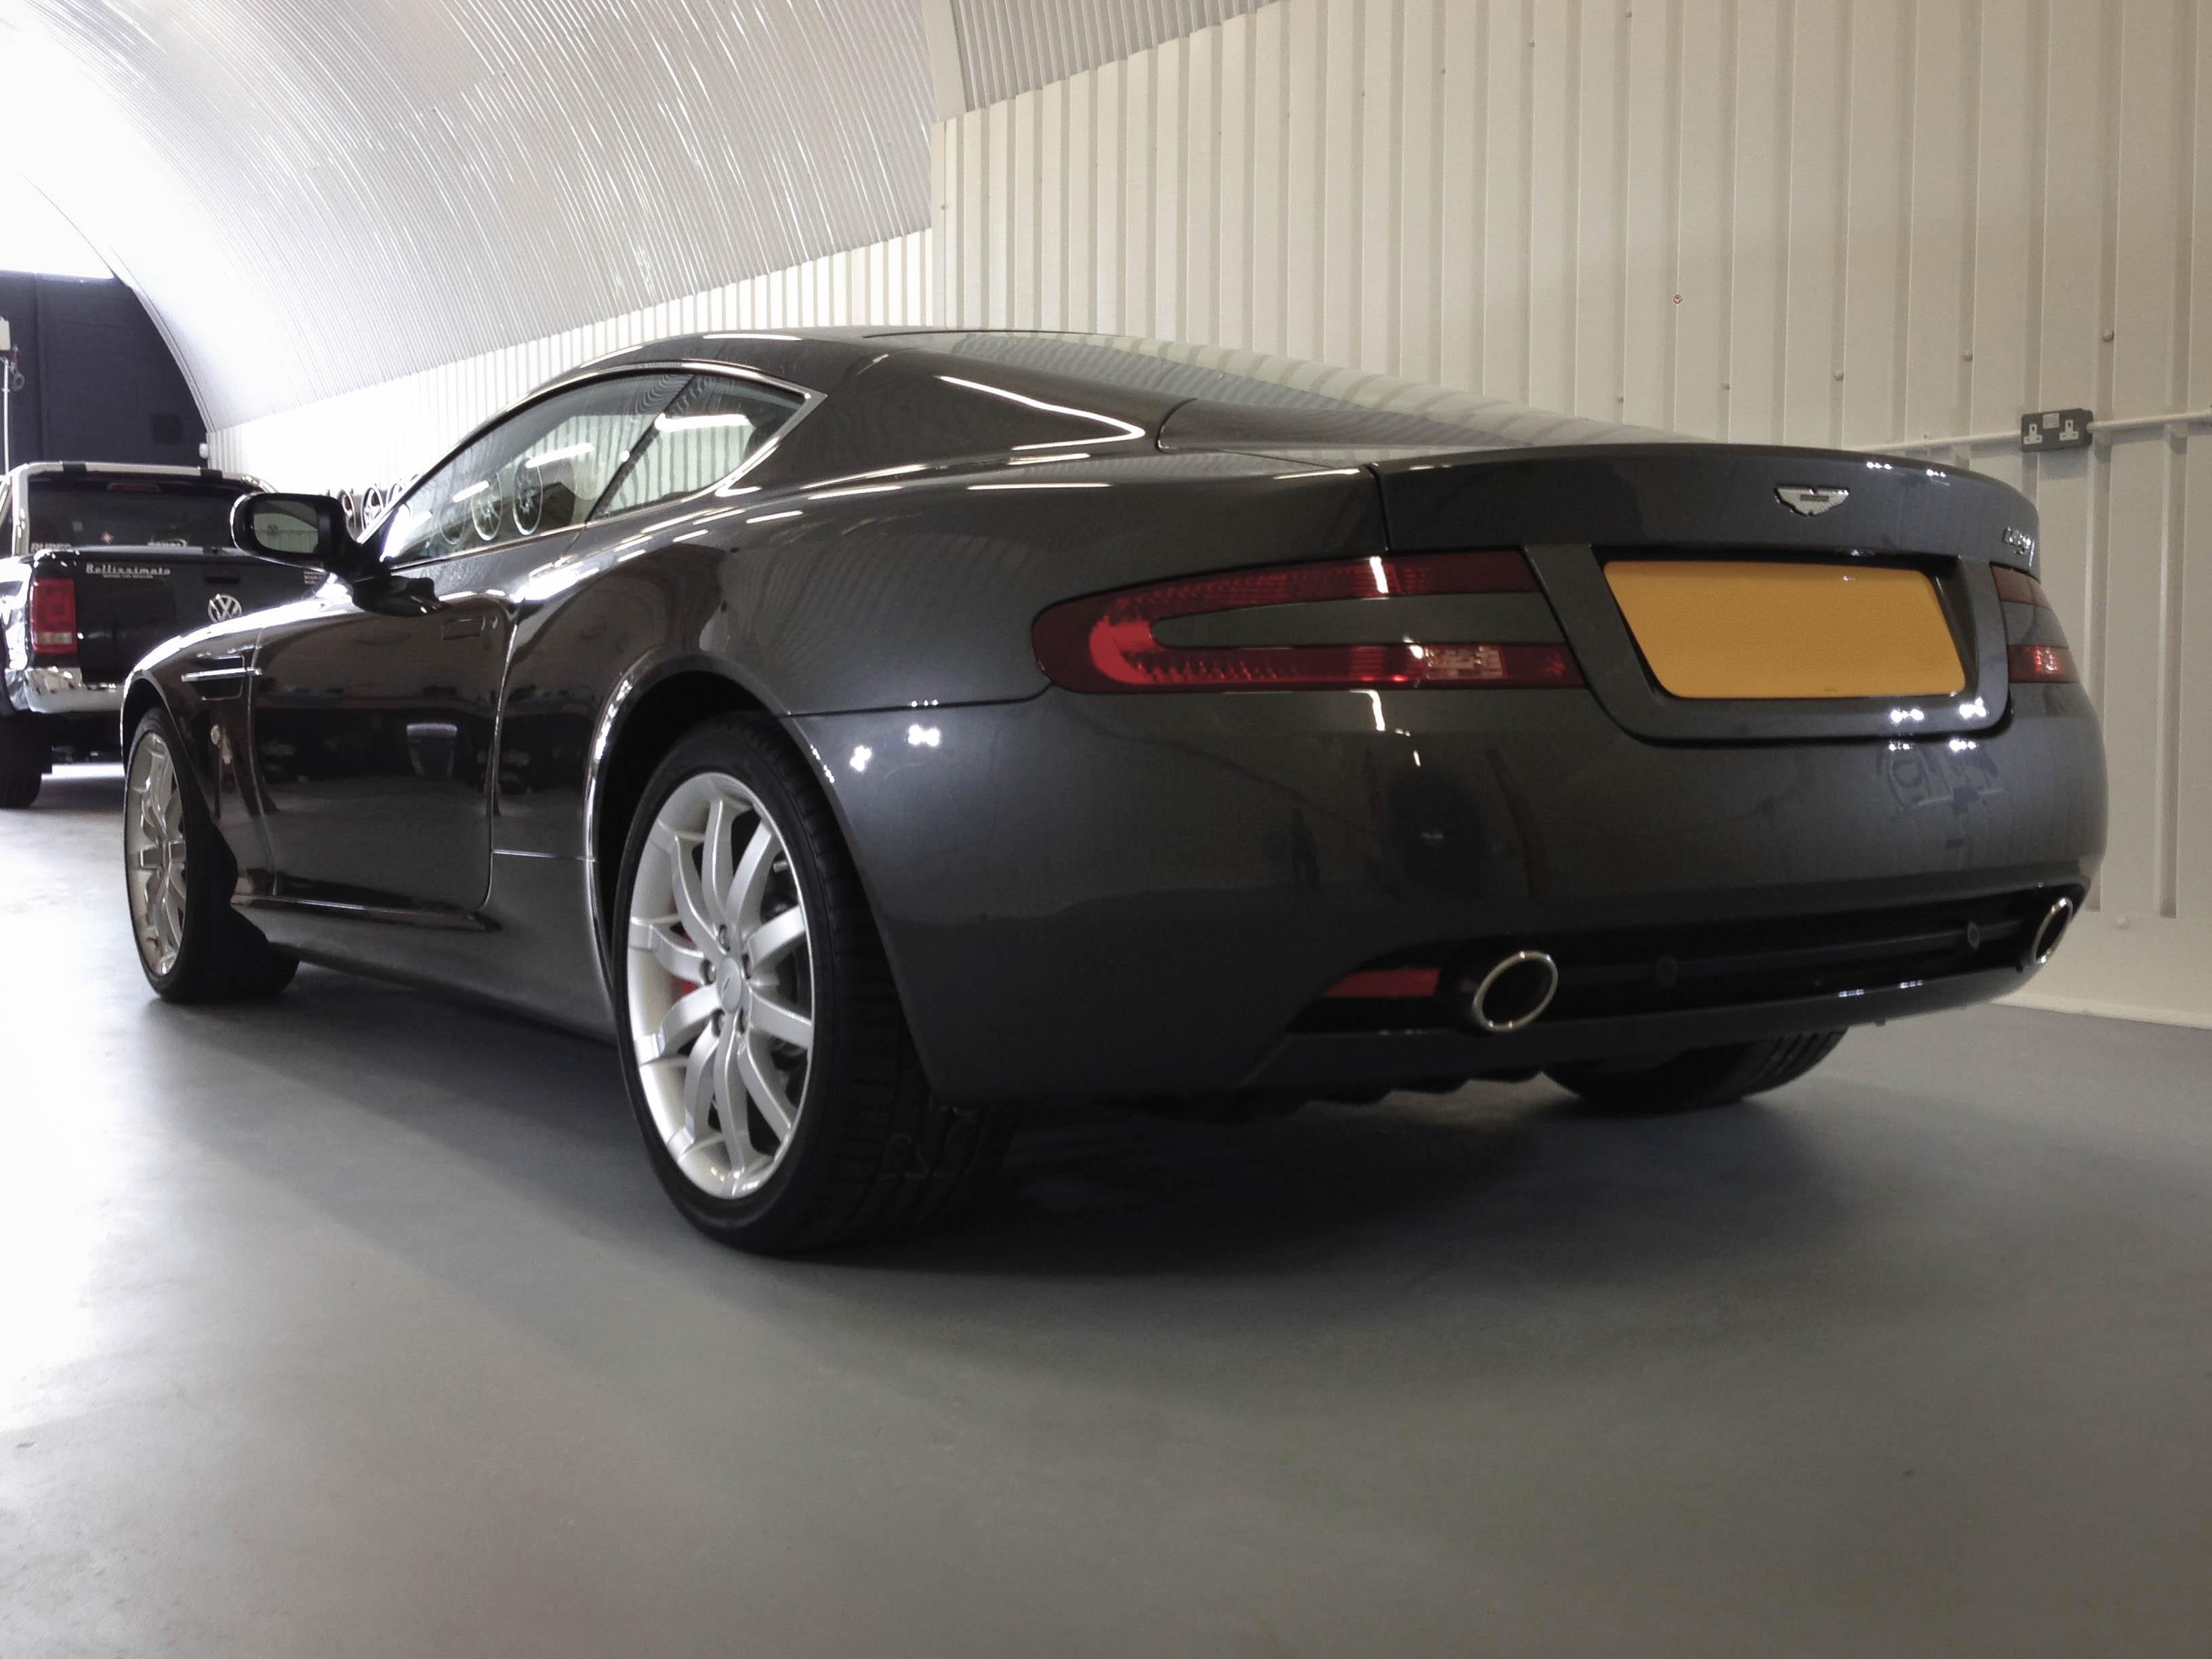 Aston Martin DB9 – Rear